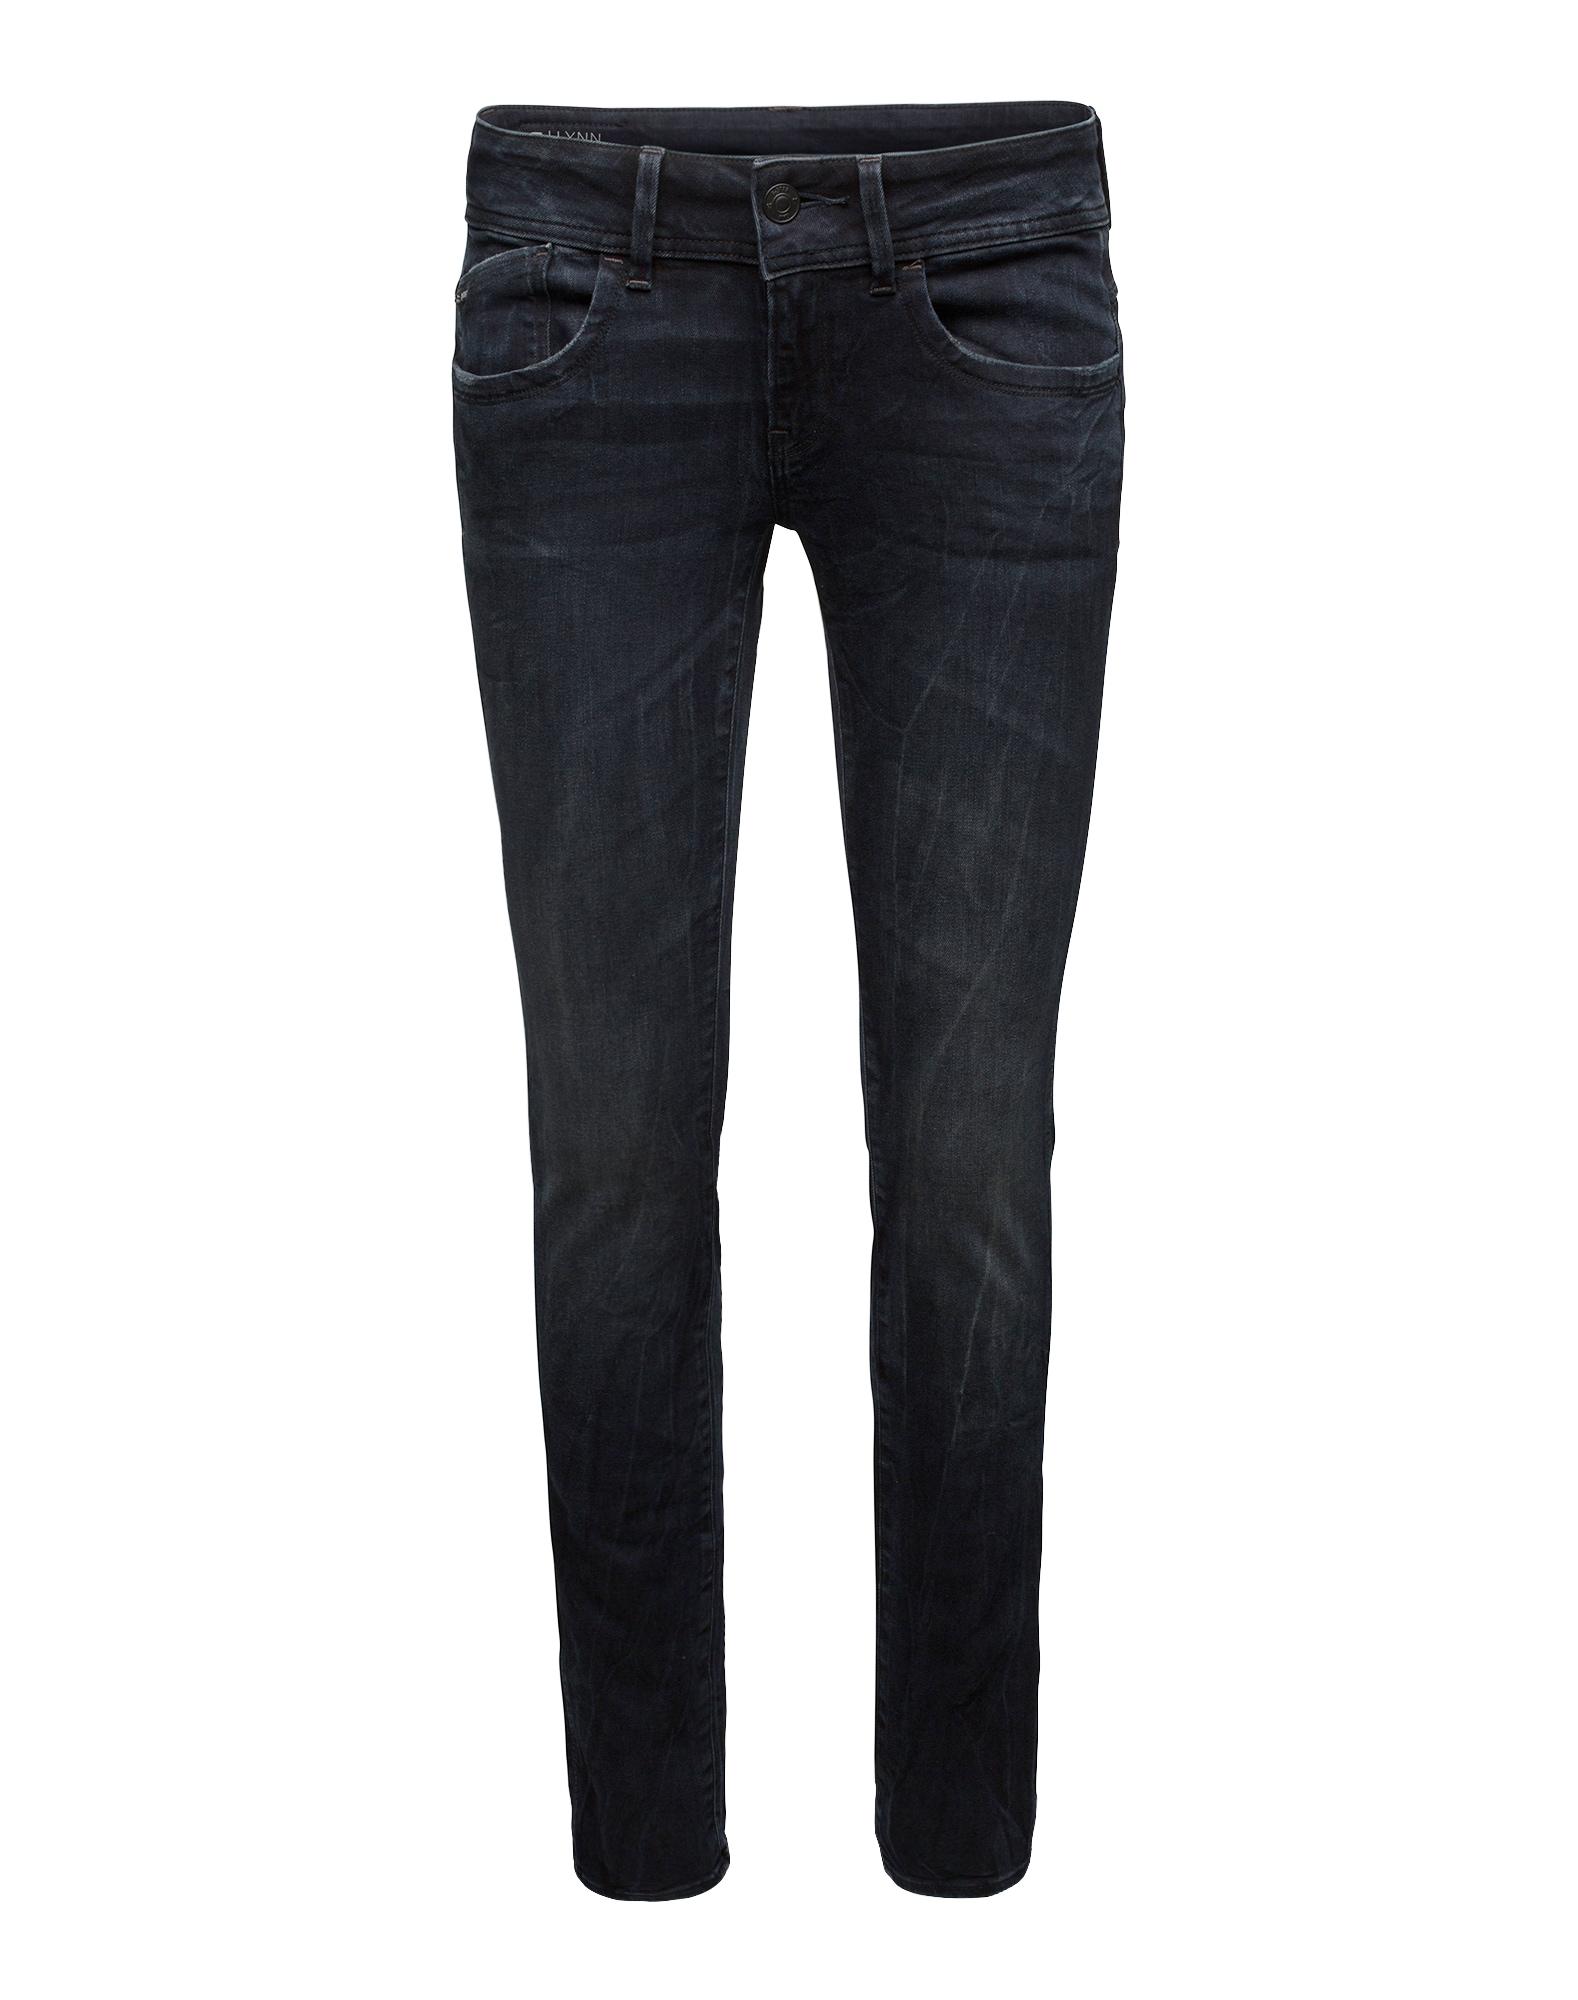 G-STAR RAW Dames Jeans Lynn Mid Skinny nachtblauw donkerblauw